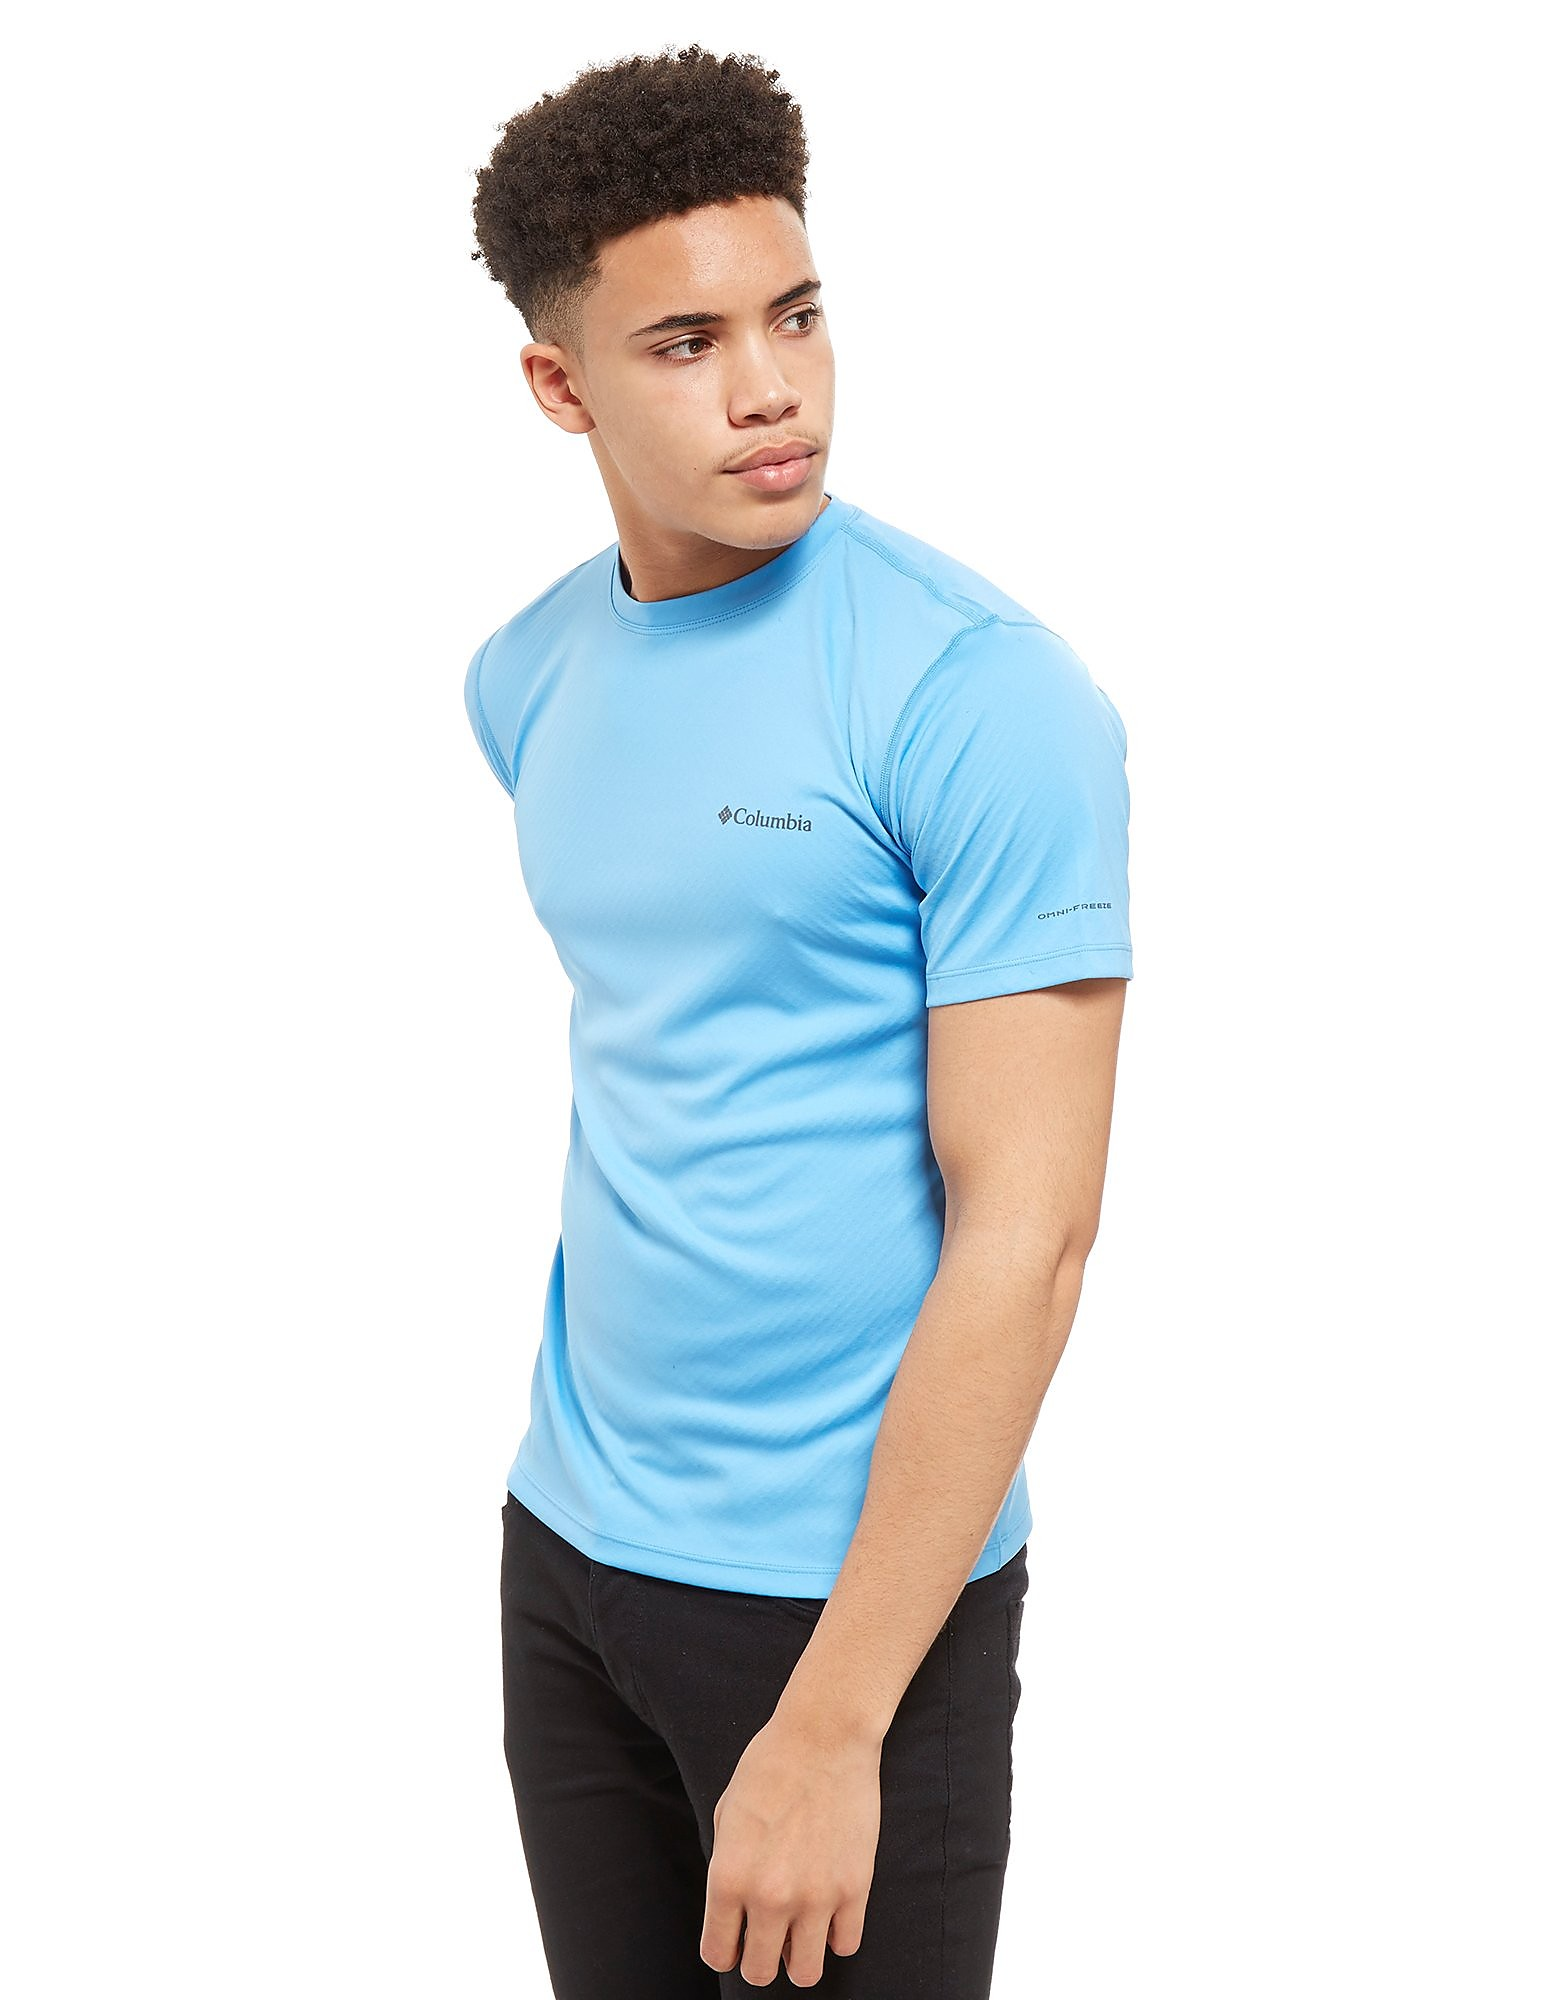 Columbia Short Sleeve Poly Tech T-Shirt Heren - Blauw - Heren